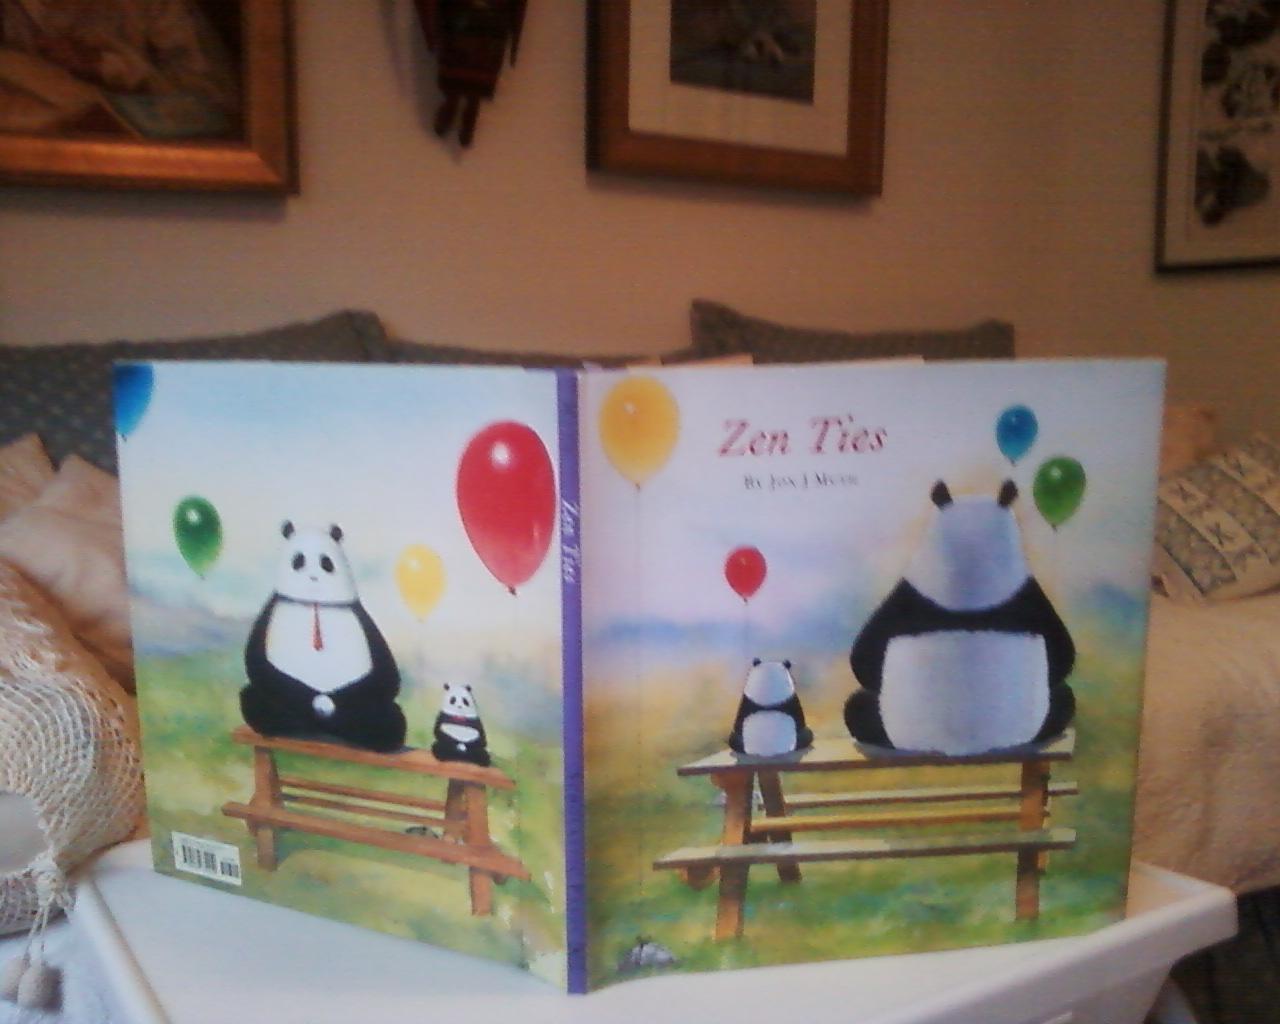 Bonnie S Books Zen Ties By Jon J Muth